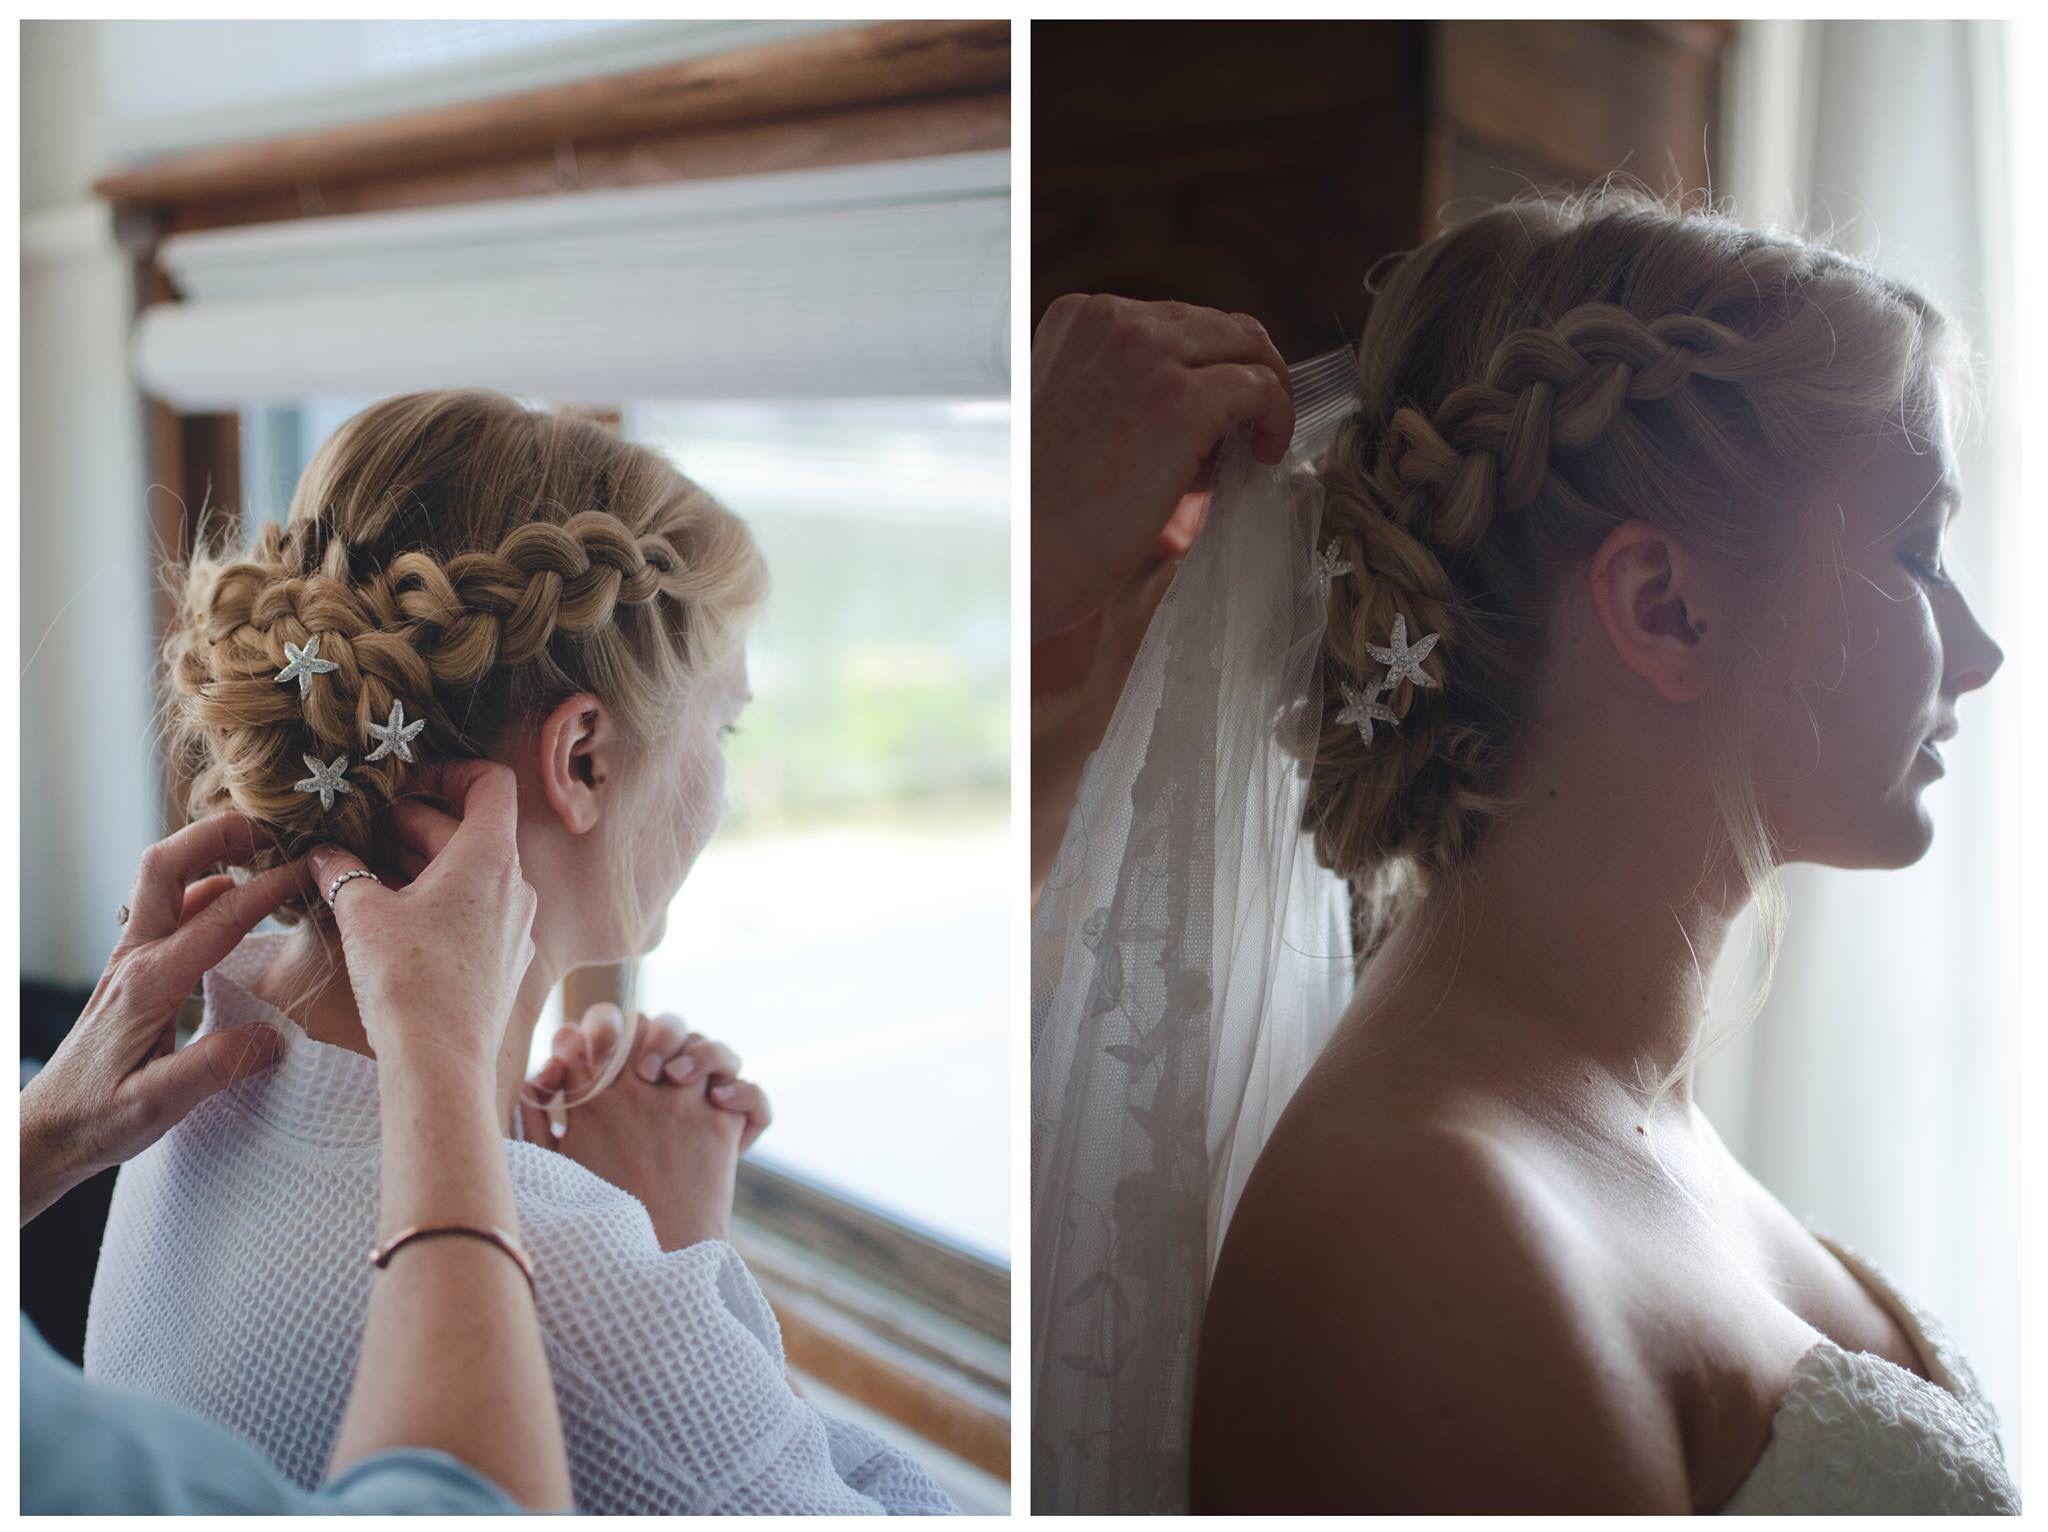 bridal updo updo with braids wedding hairstyle beach bride